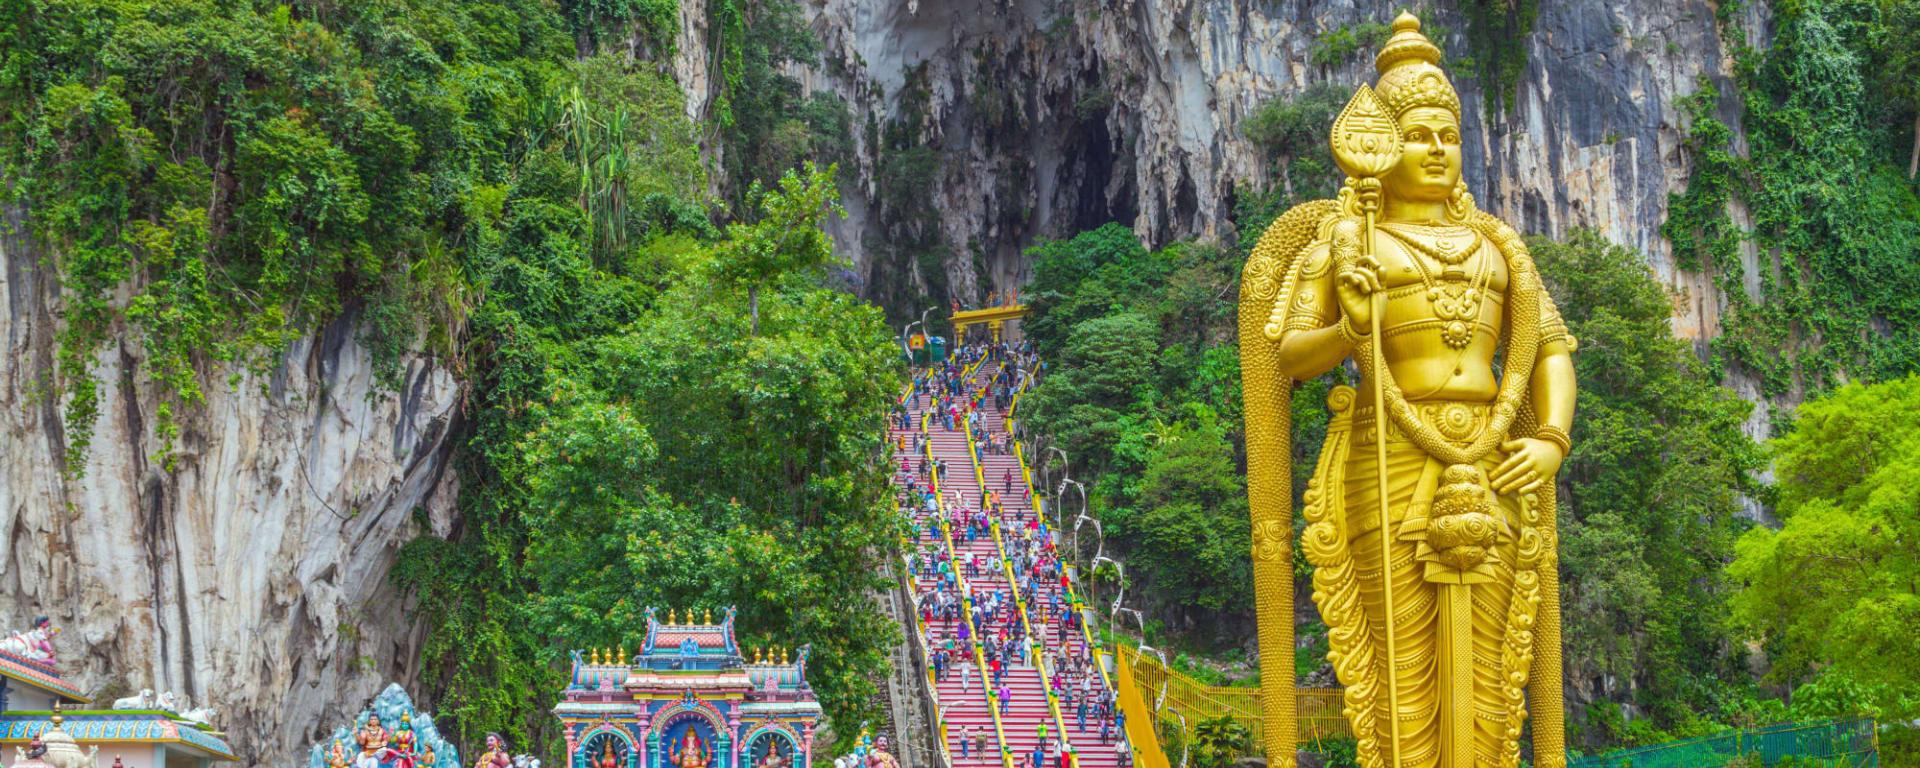 Batu Höhlen, EN, Halbtägig in Kuala Lumpur: Malaysia Kuala Lumpur Batu Hoehlen